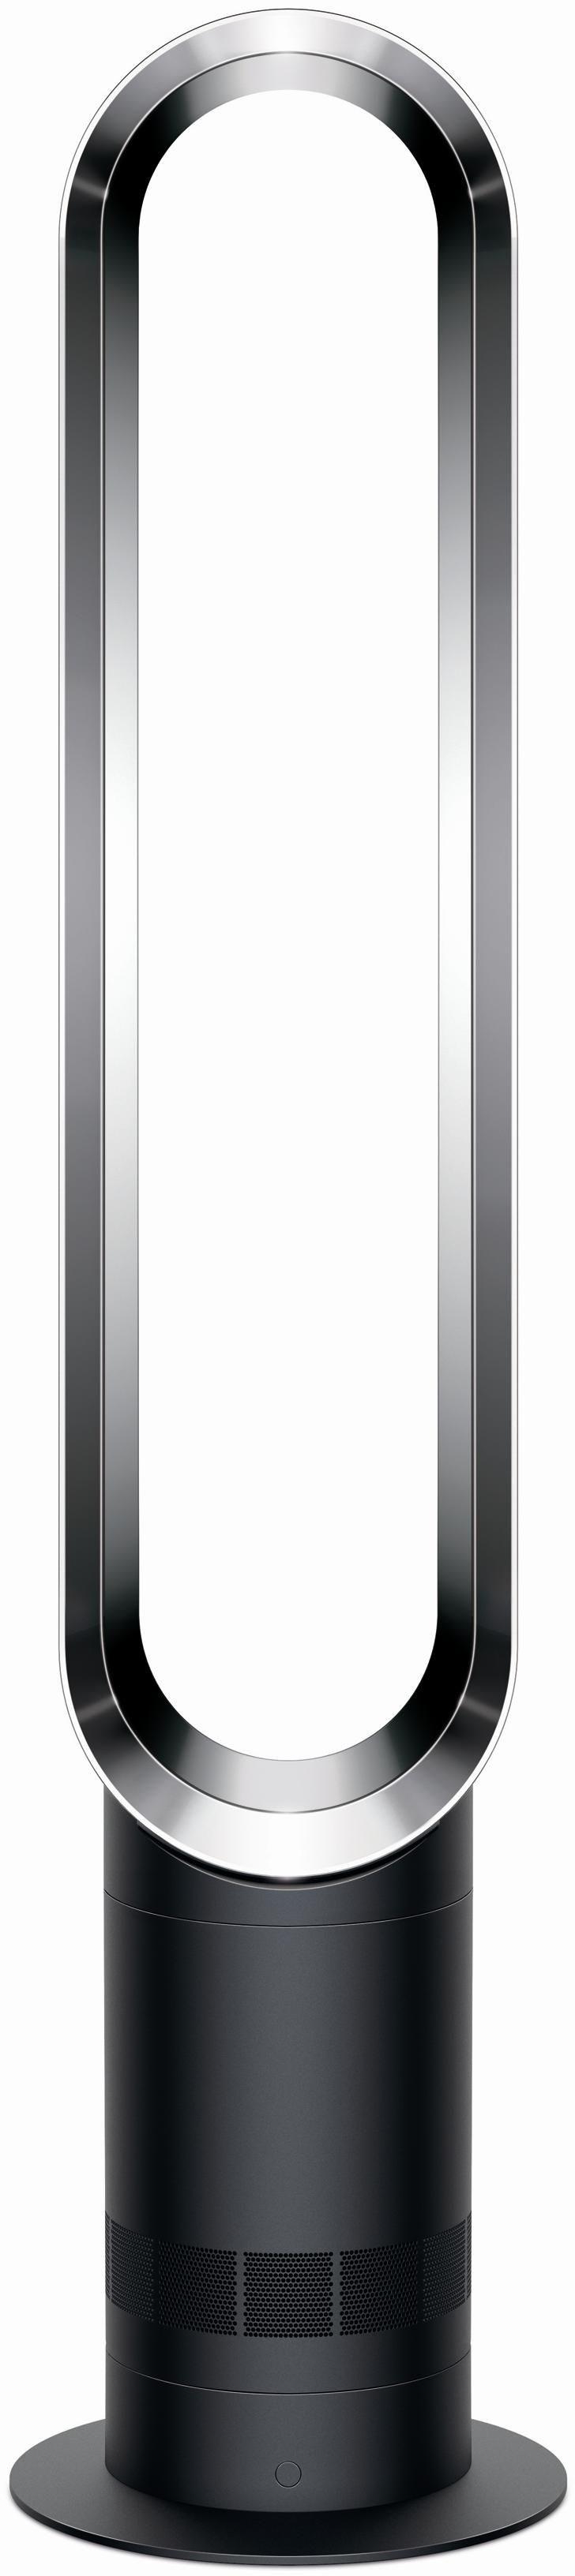 Dyson AM07 Turmventilator schwarz/nickel